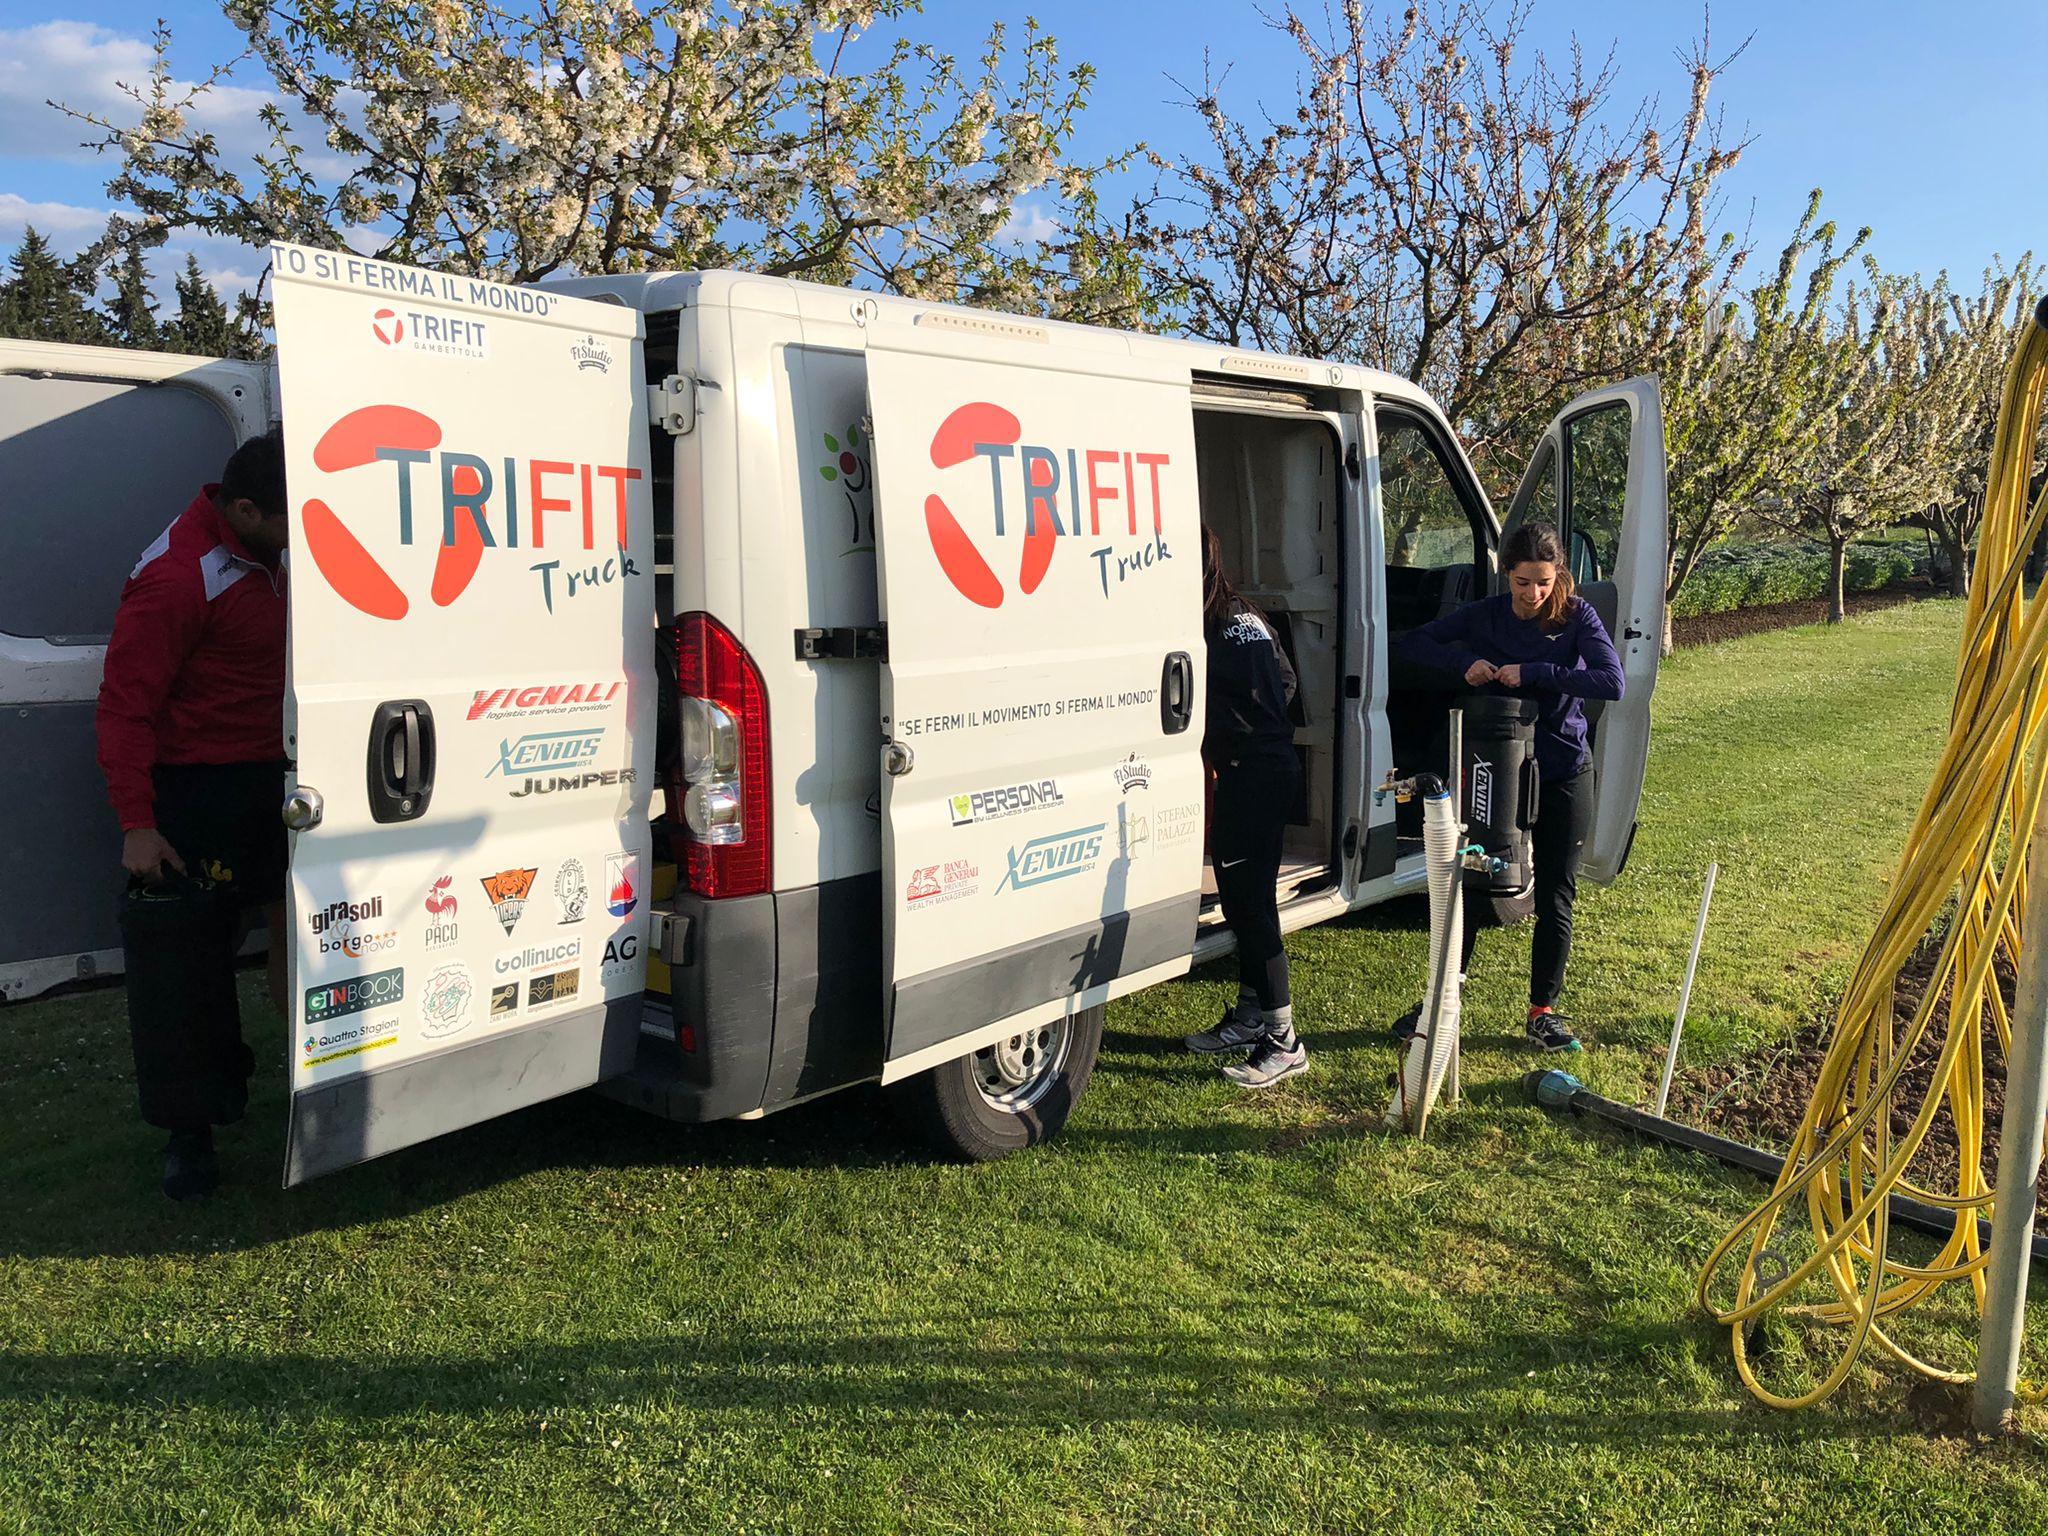 trifit truck